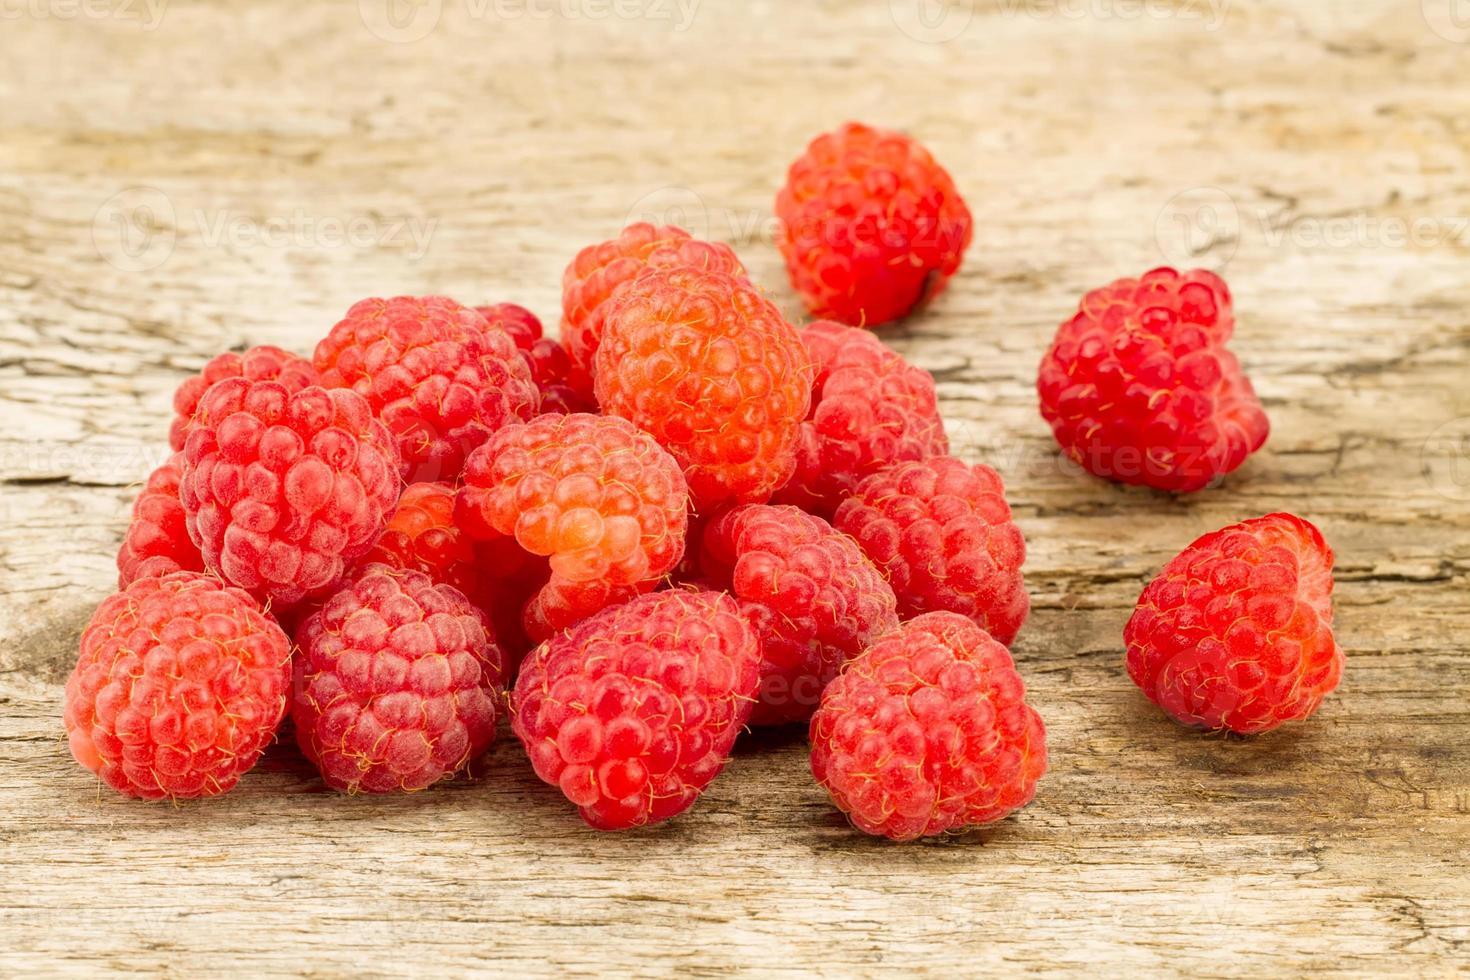 ripe raspberries closeup on wooden background photo